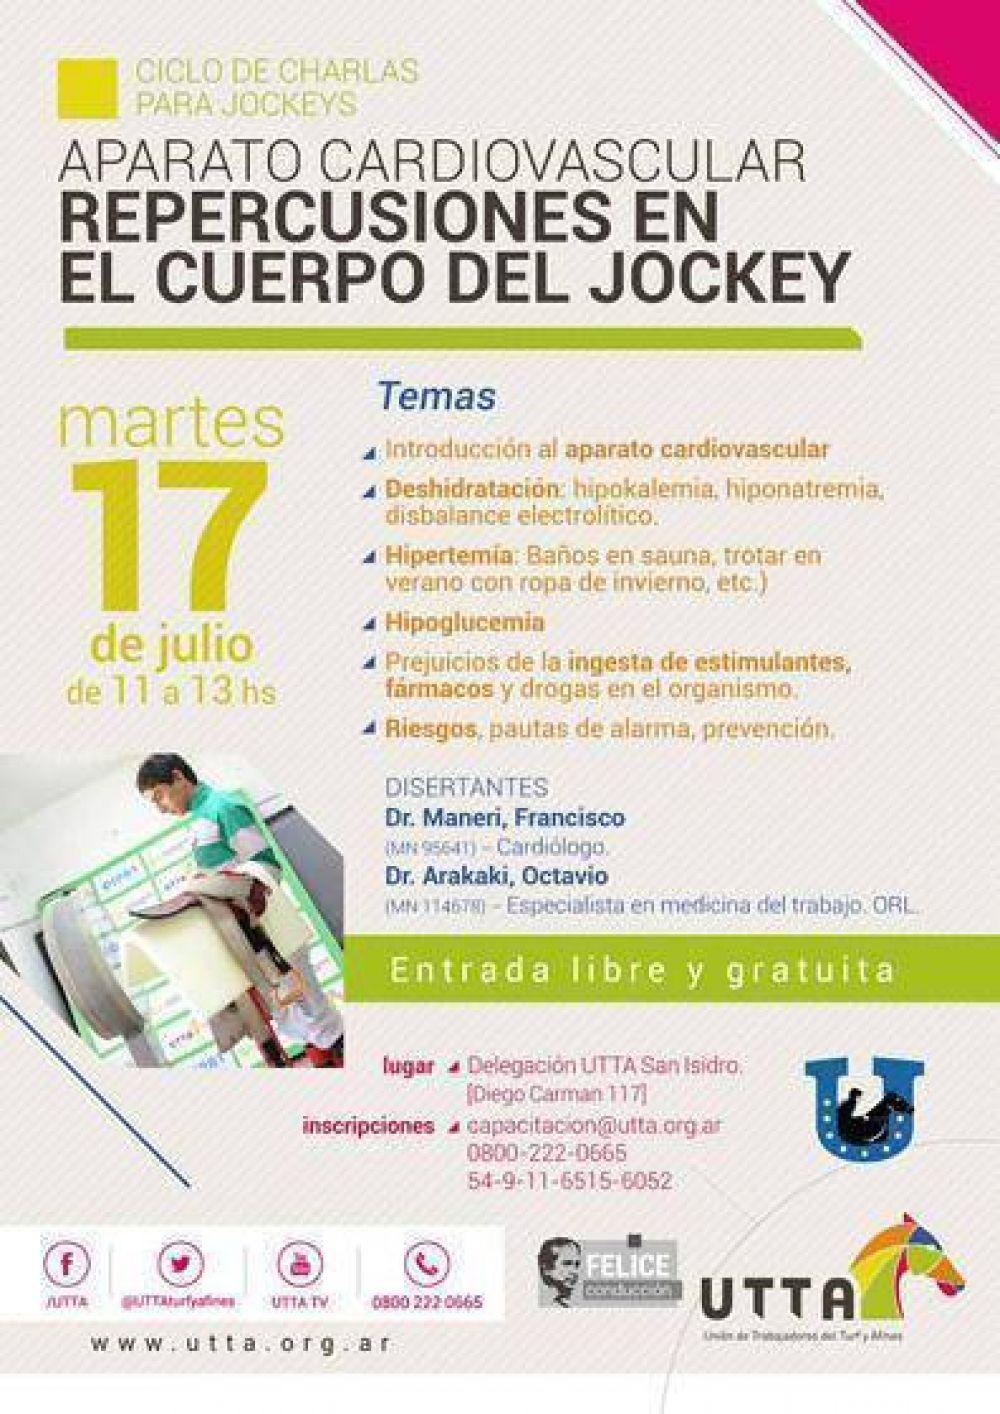 La UTTA organiza una charla sanitaria para jockeys